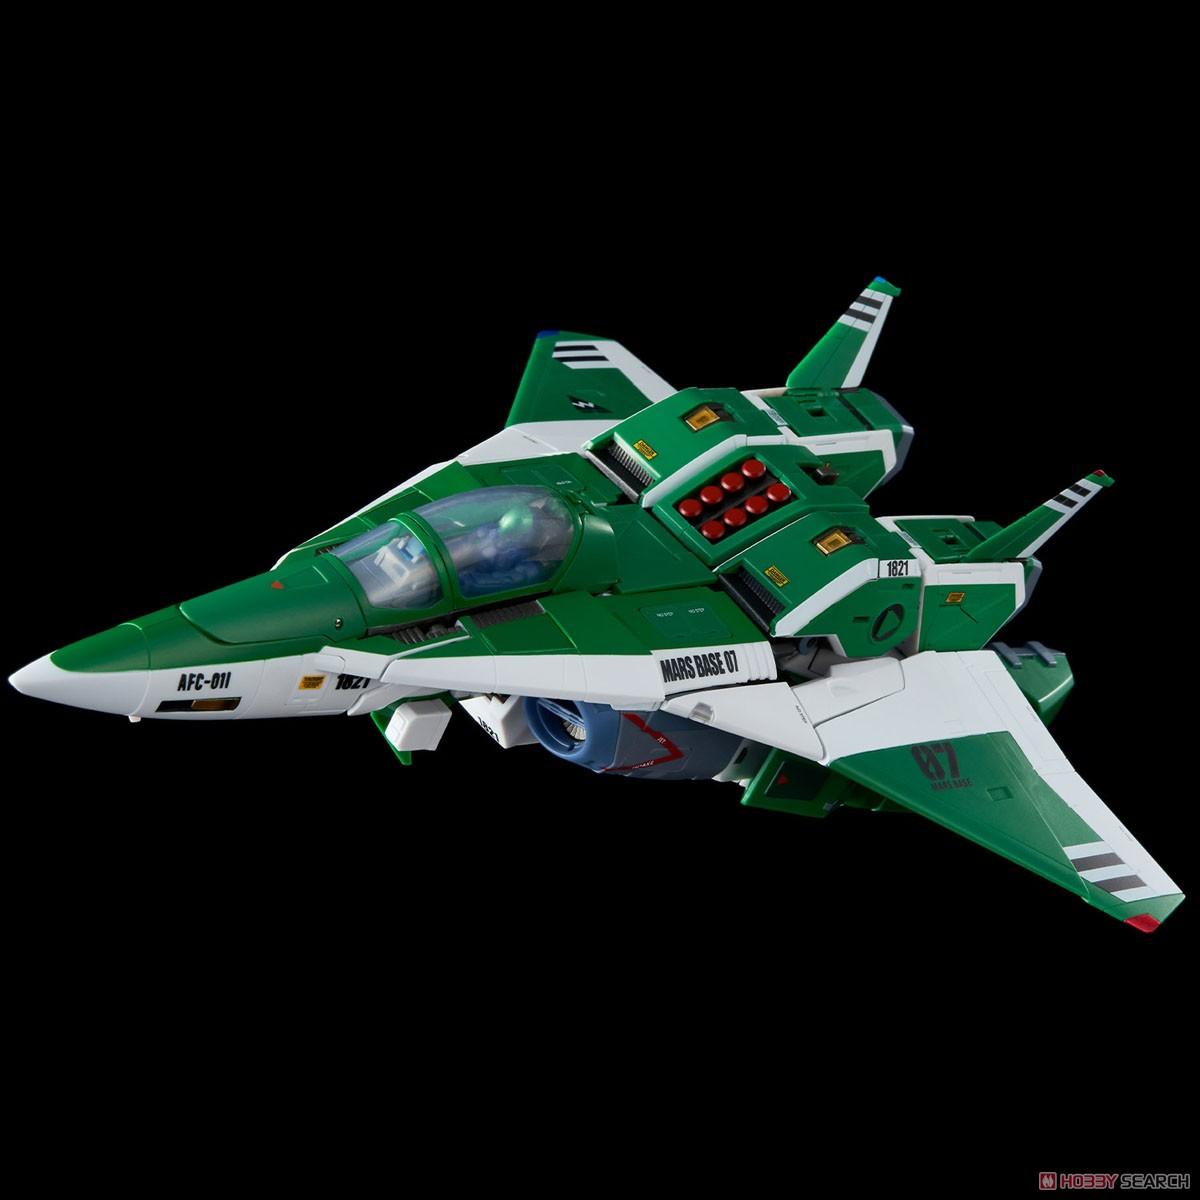 RIOBOT『AFC-01I レギオス・イオタ』機甲創世記モスピーダ 1/48 可変可動フィギュア-012